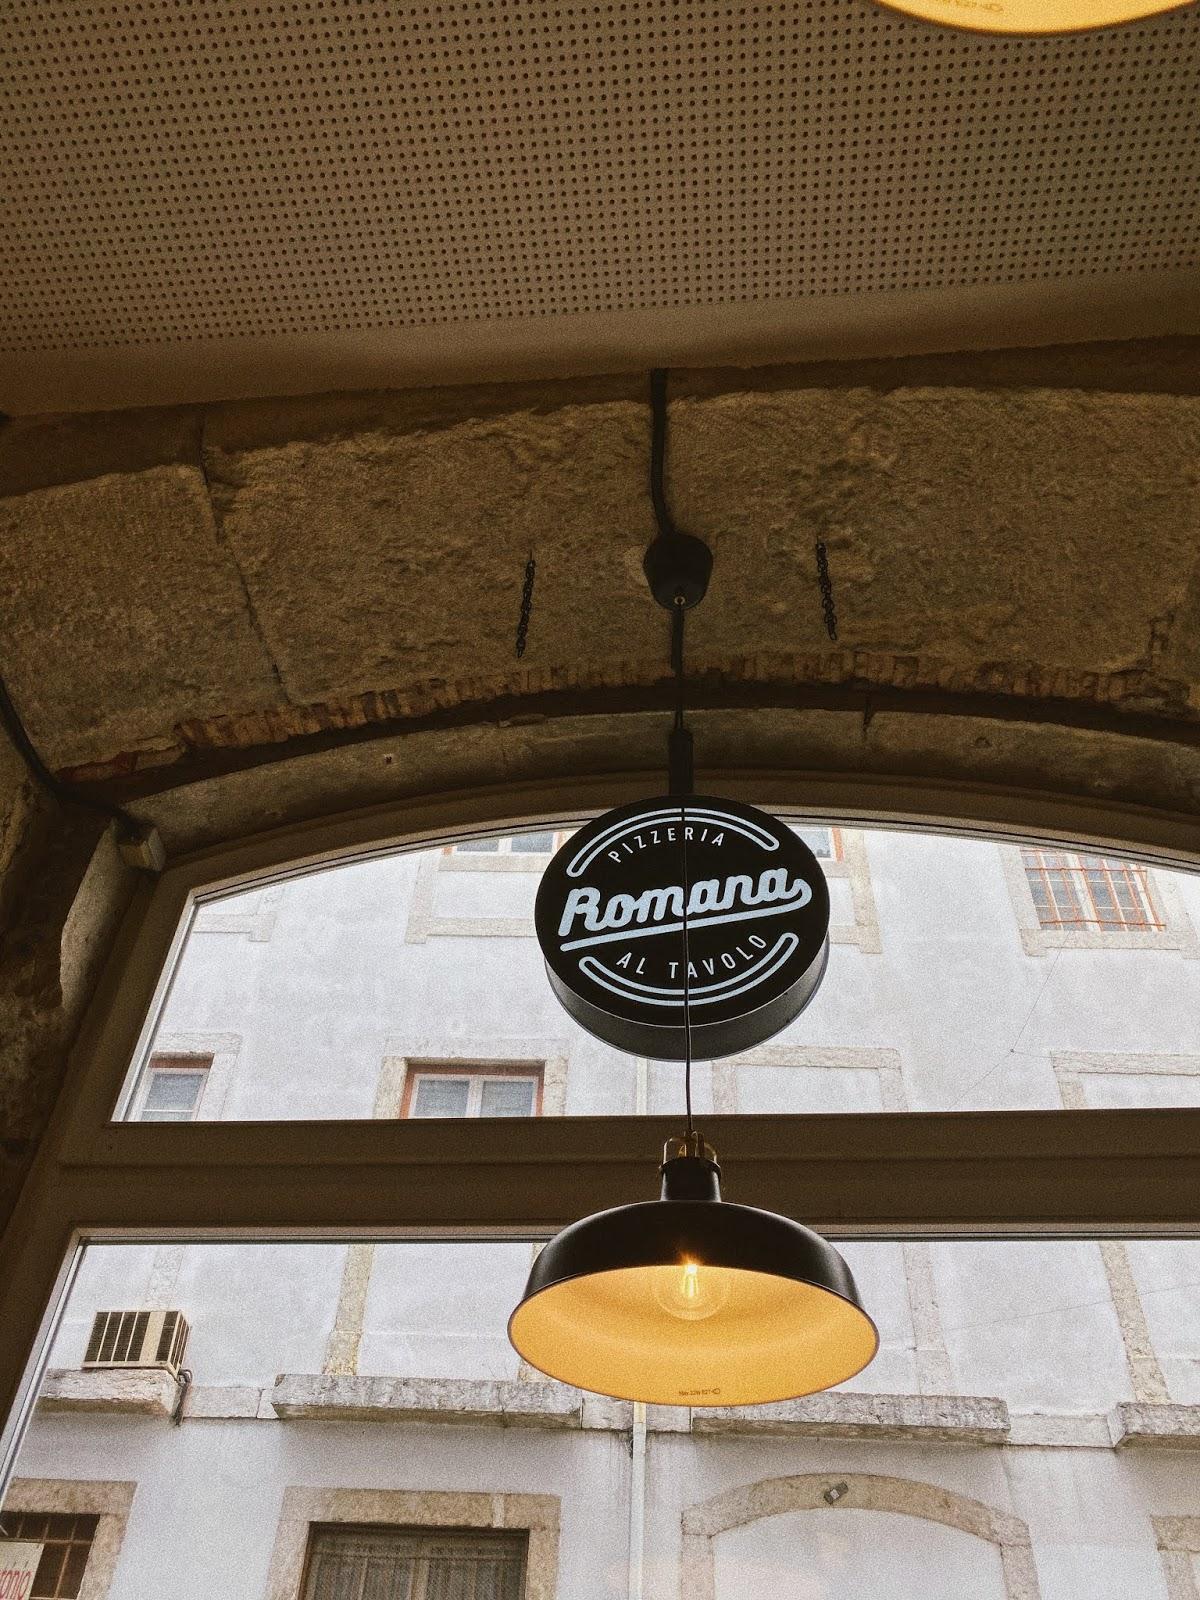 romana-pizzeria-alfama-lisbon-portugal